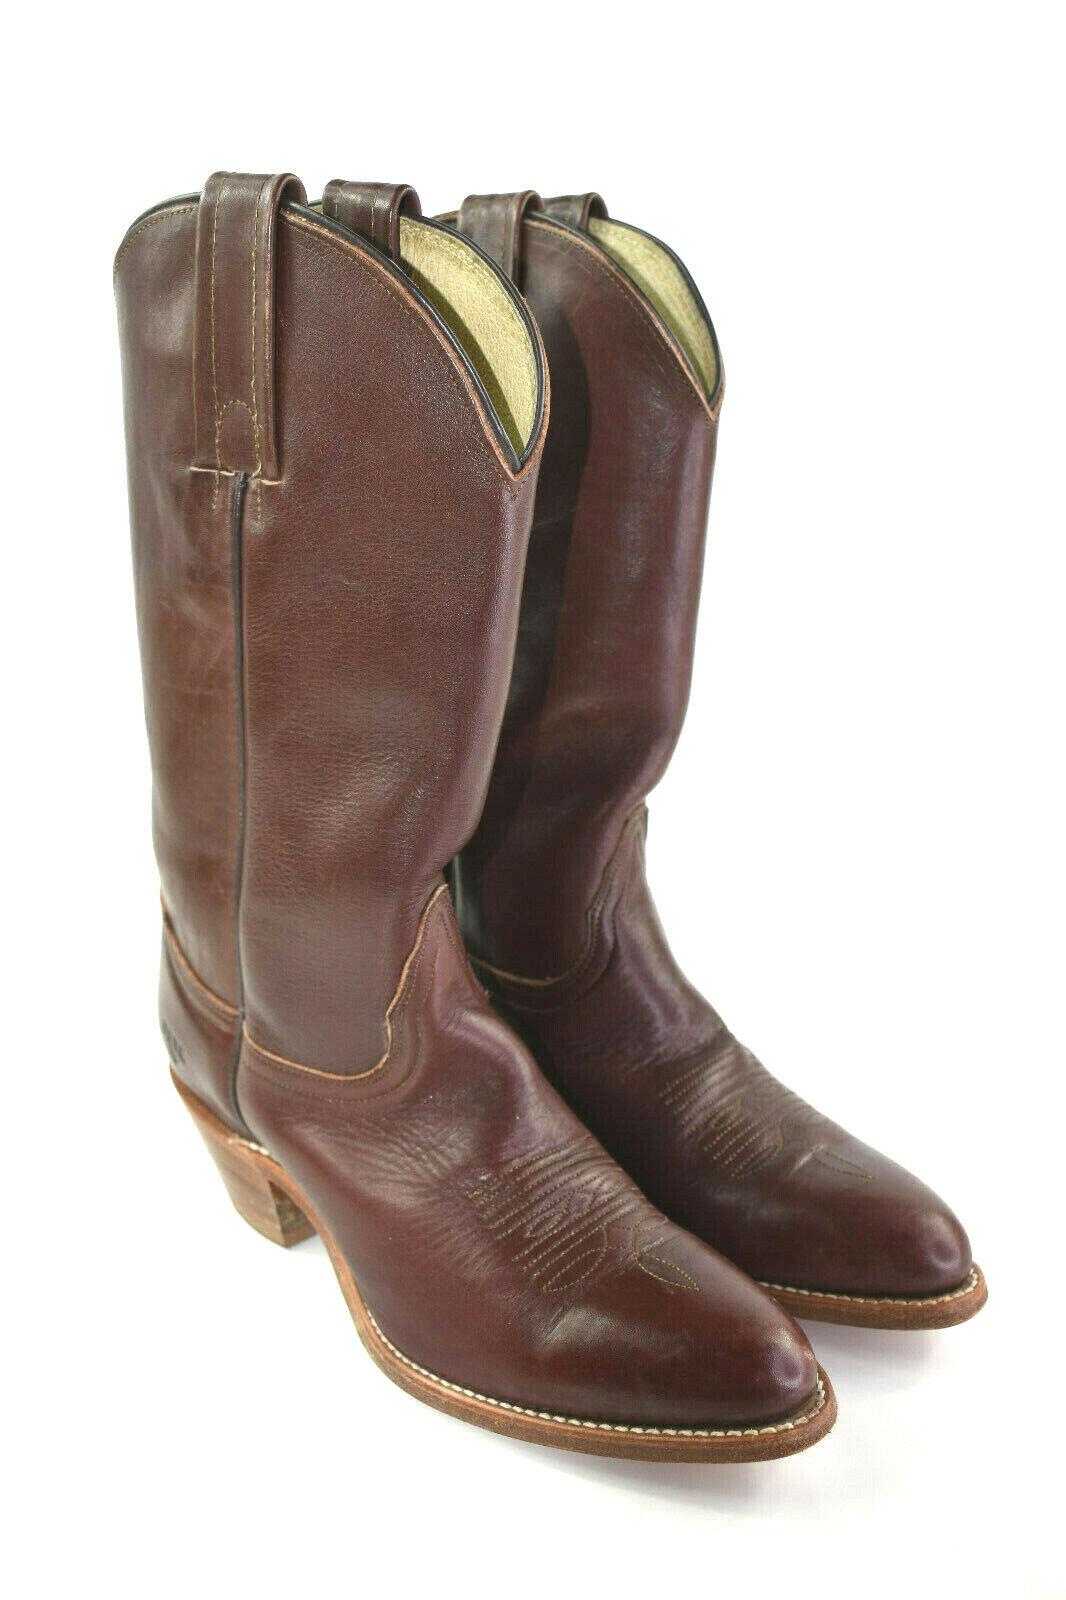 Frye Cowboy Western Stiefel Braunes Leder Damen Größe 8B